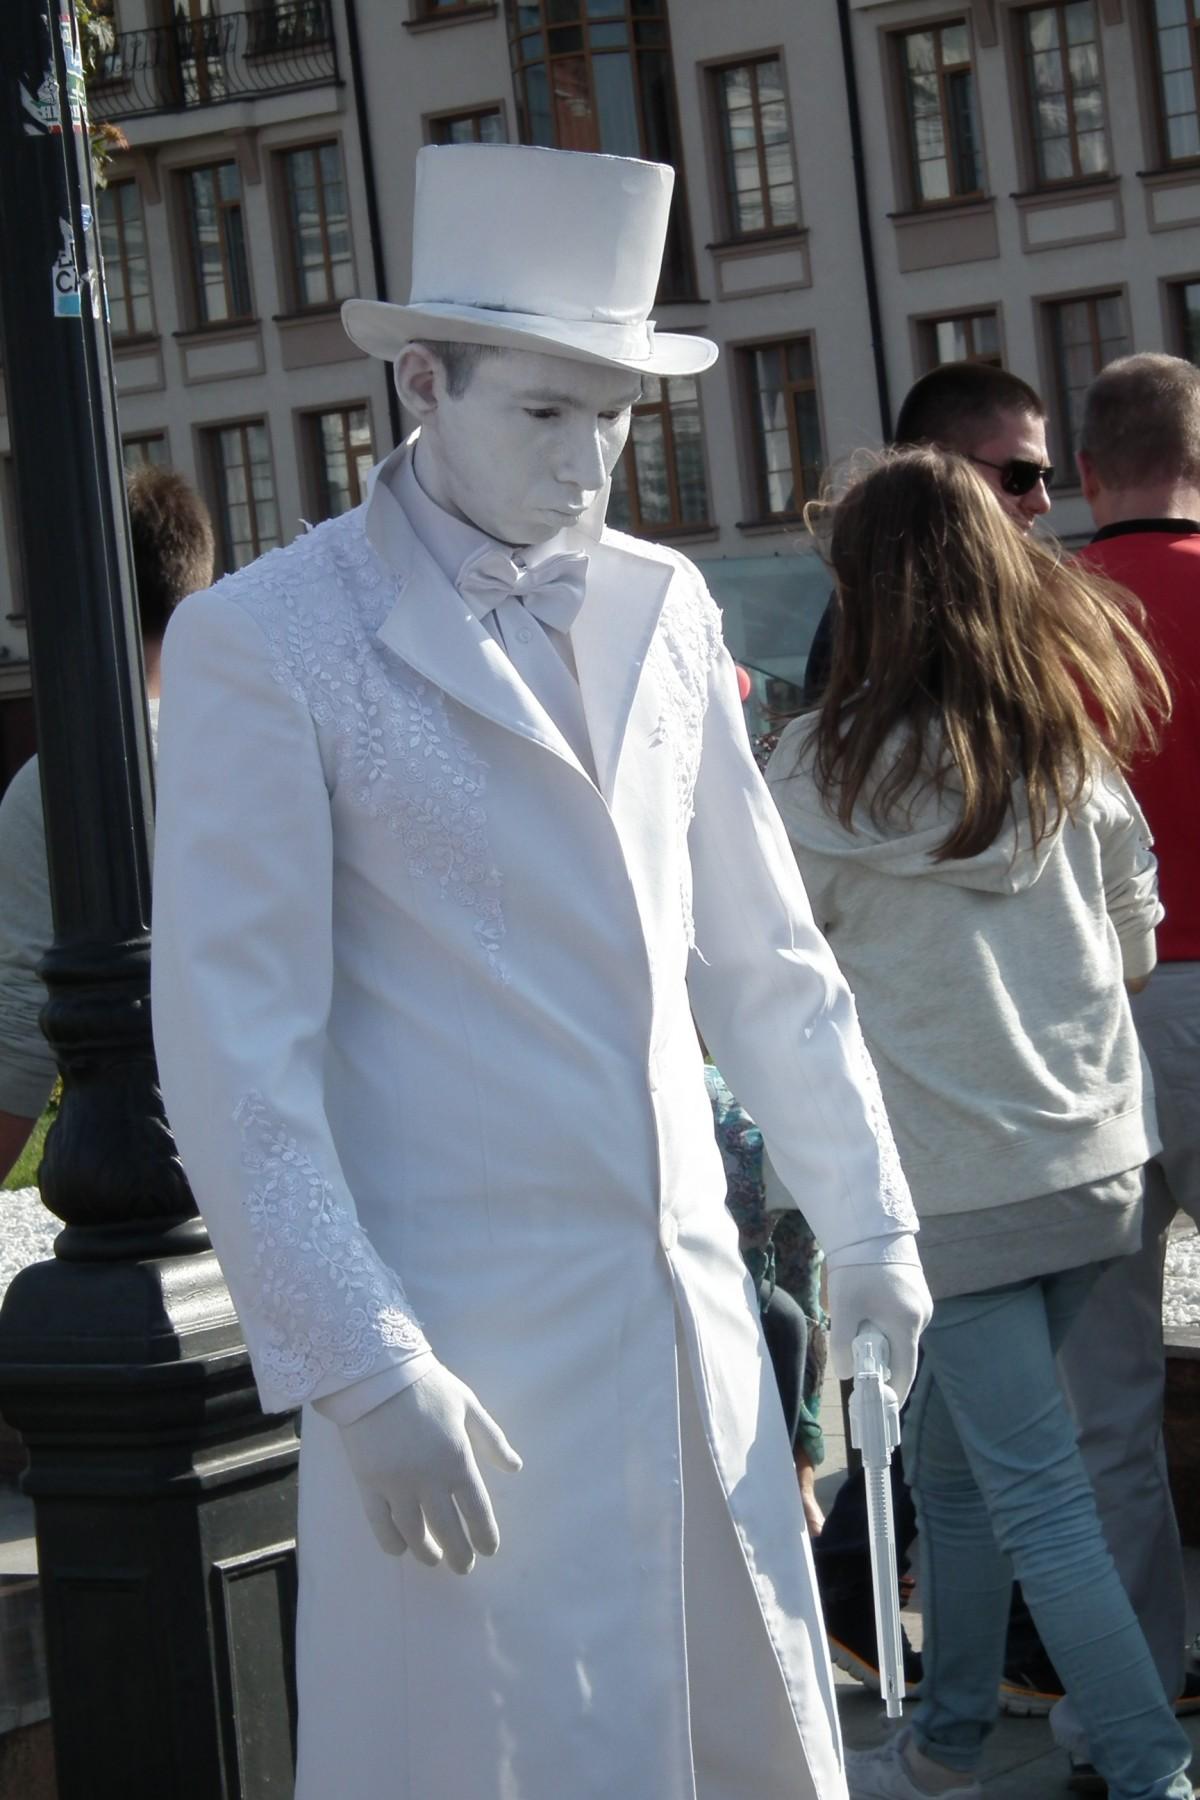 Fotos gratis : hombre, Monumento, estatua, primavera, carnaval, artista, Moda, ropa, disfraz ...